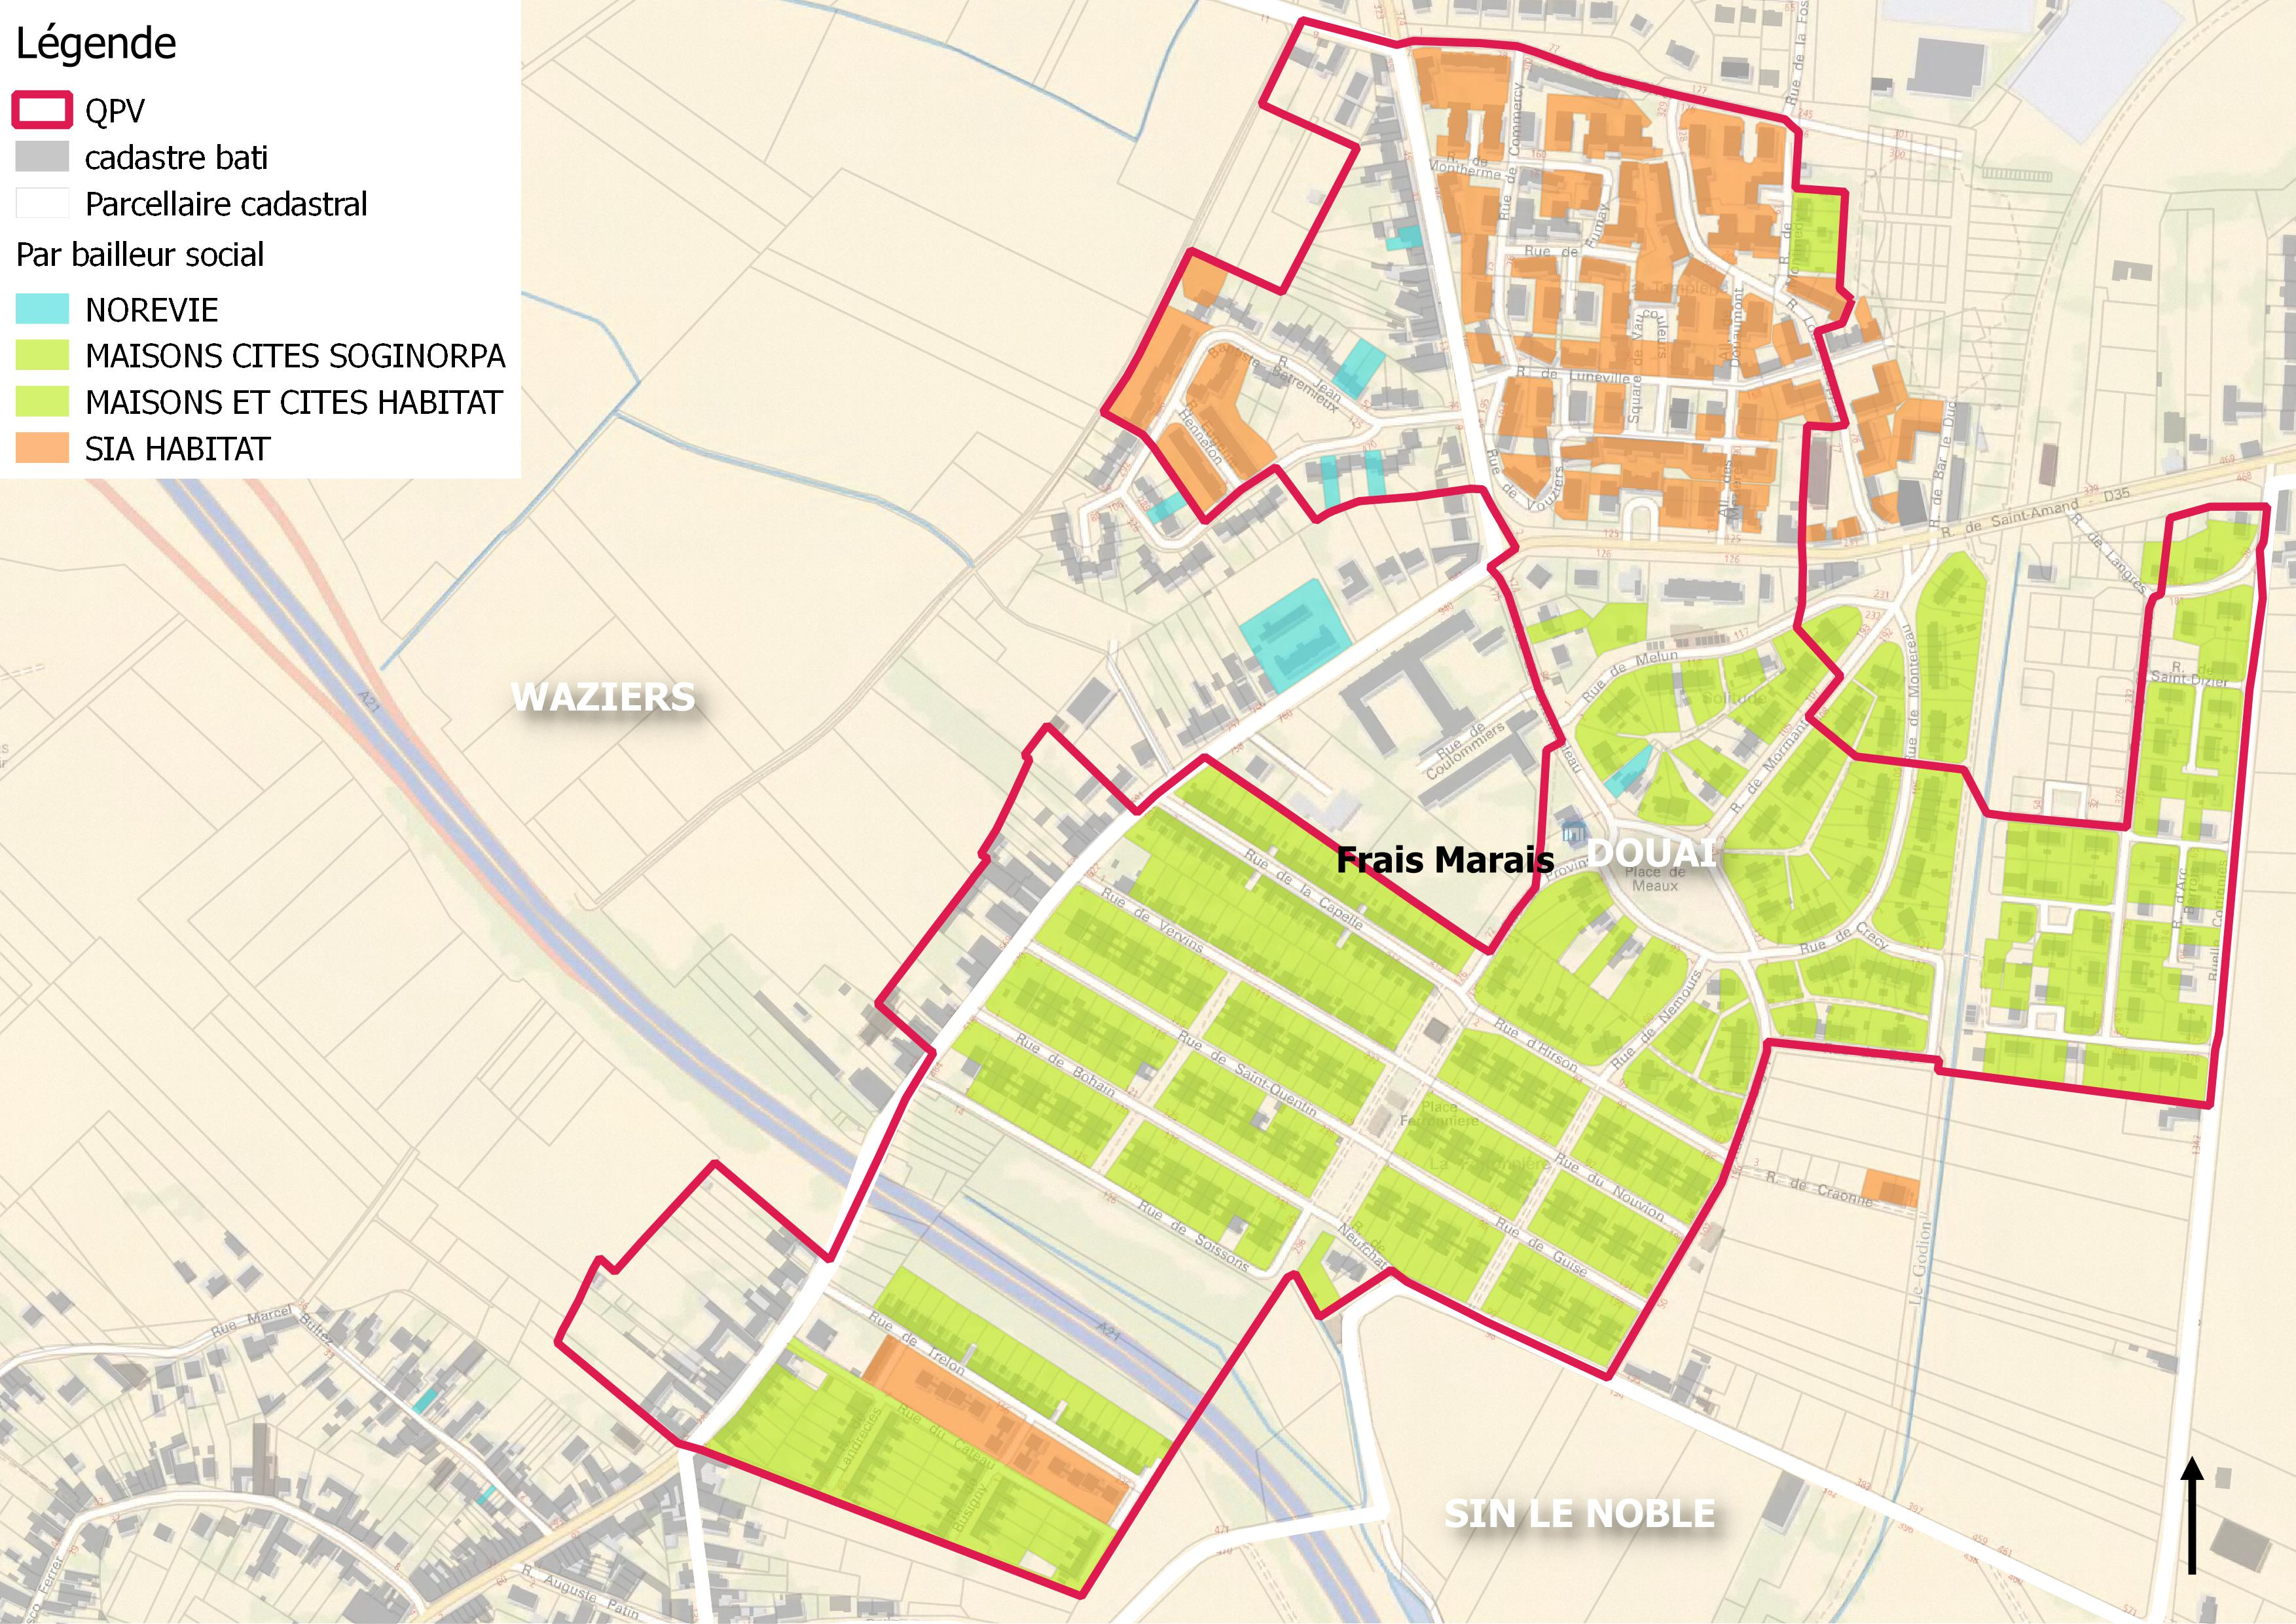 Quartiers prioritaires communaut d 39 agglom ration du - Nouvelle piscine douai ...